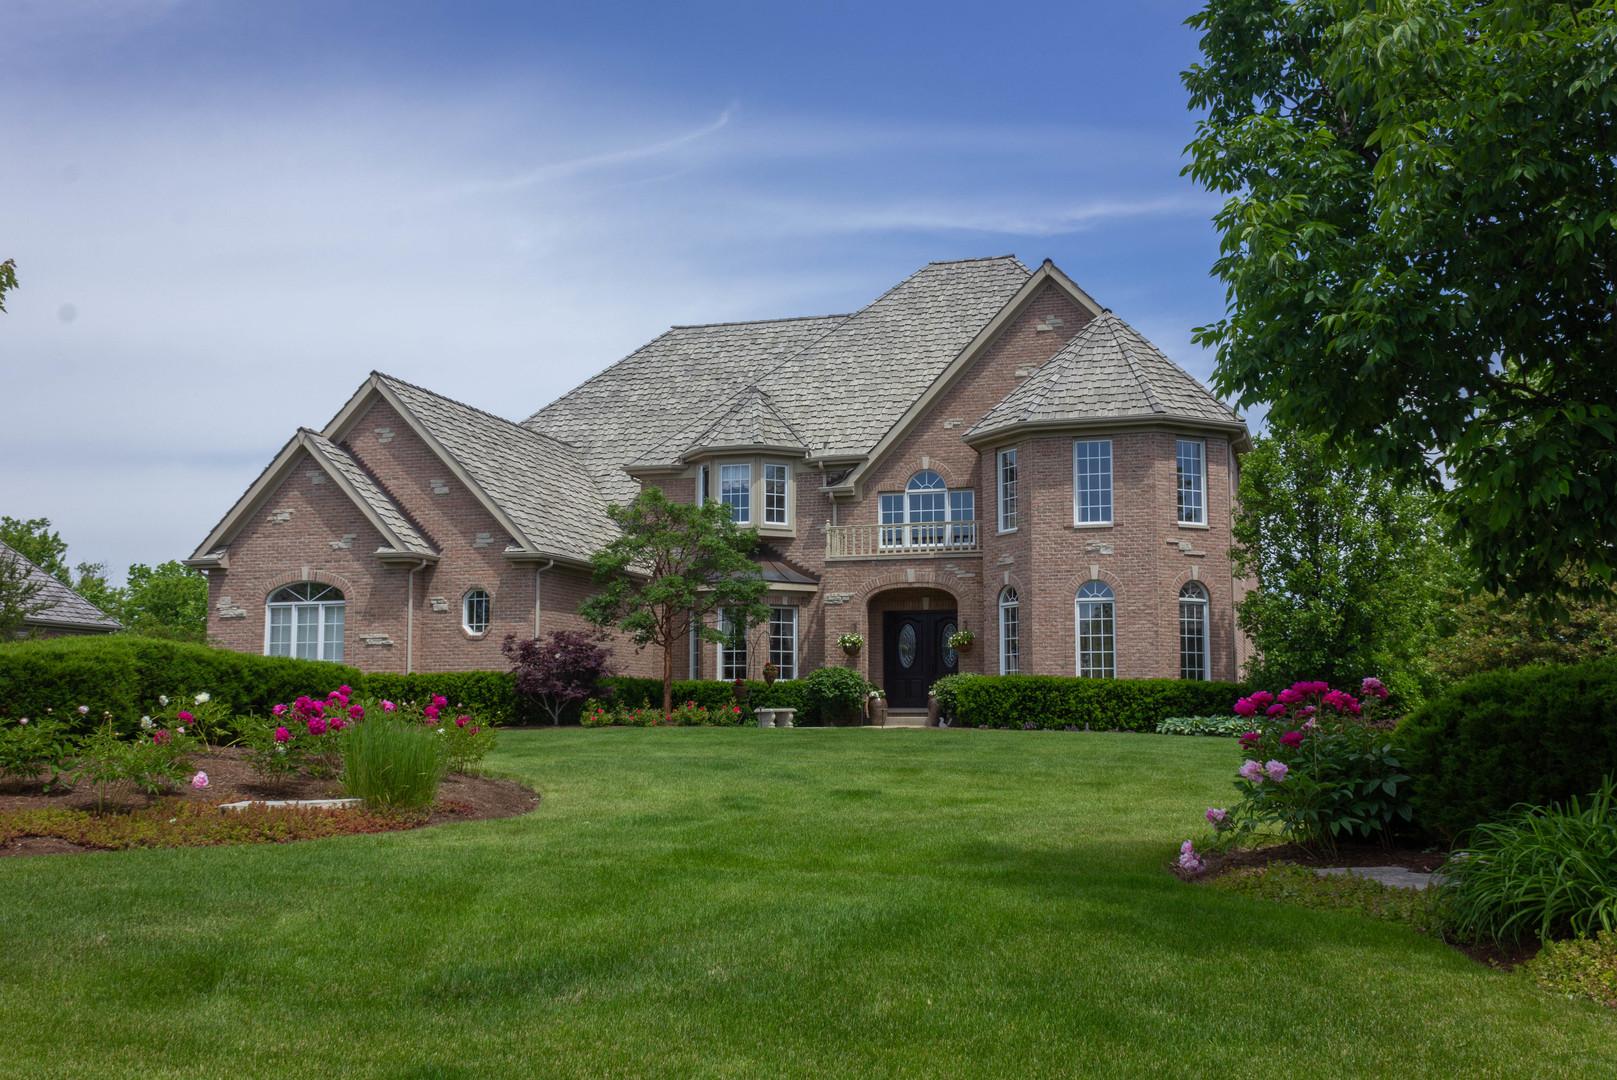 164 Cardinal Drive, Hawthorn Woods, Illinois 60047